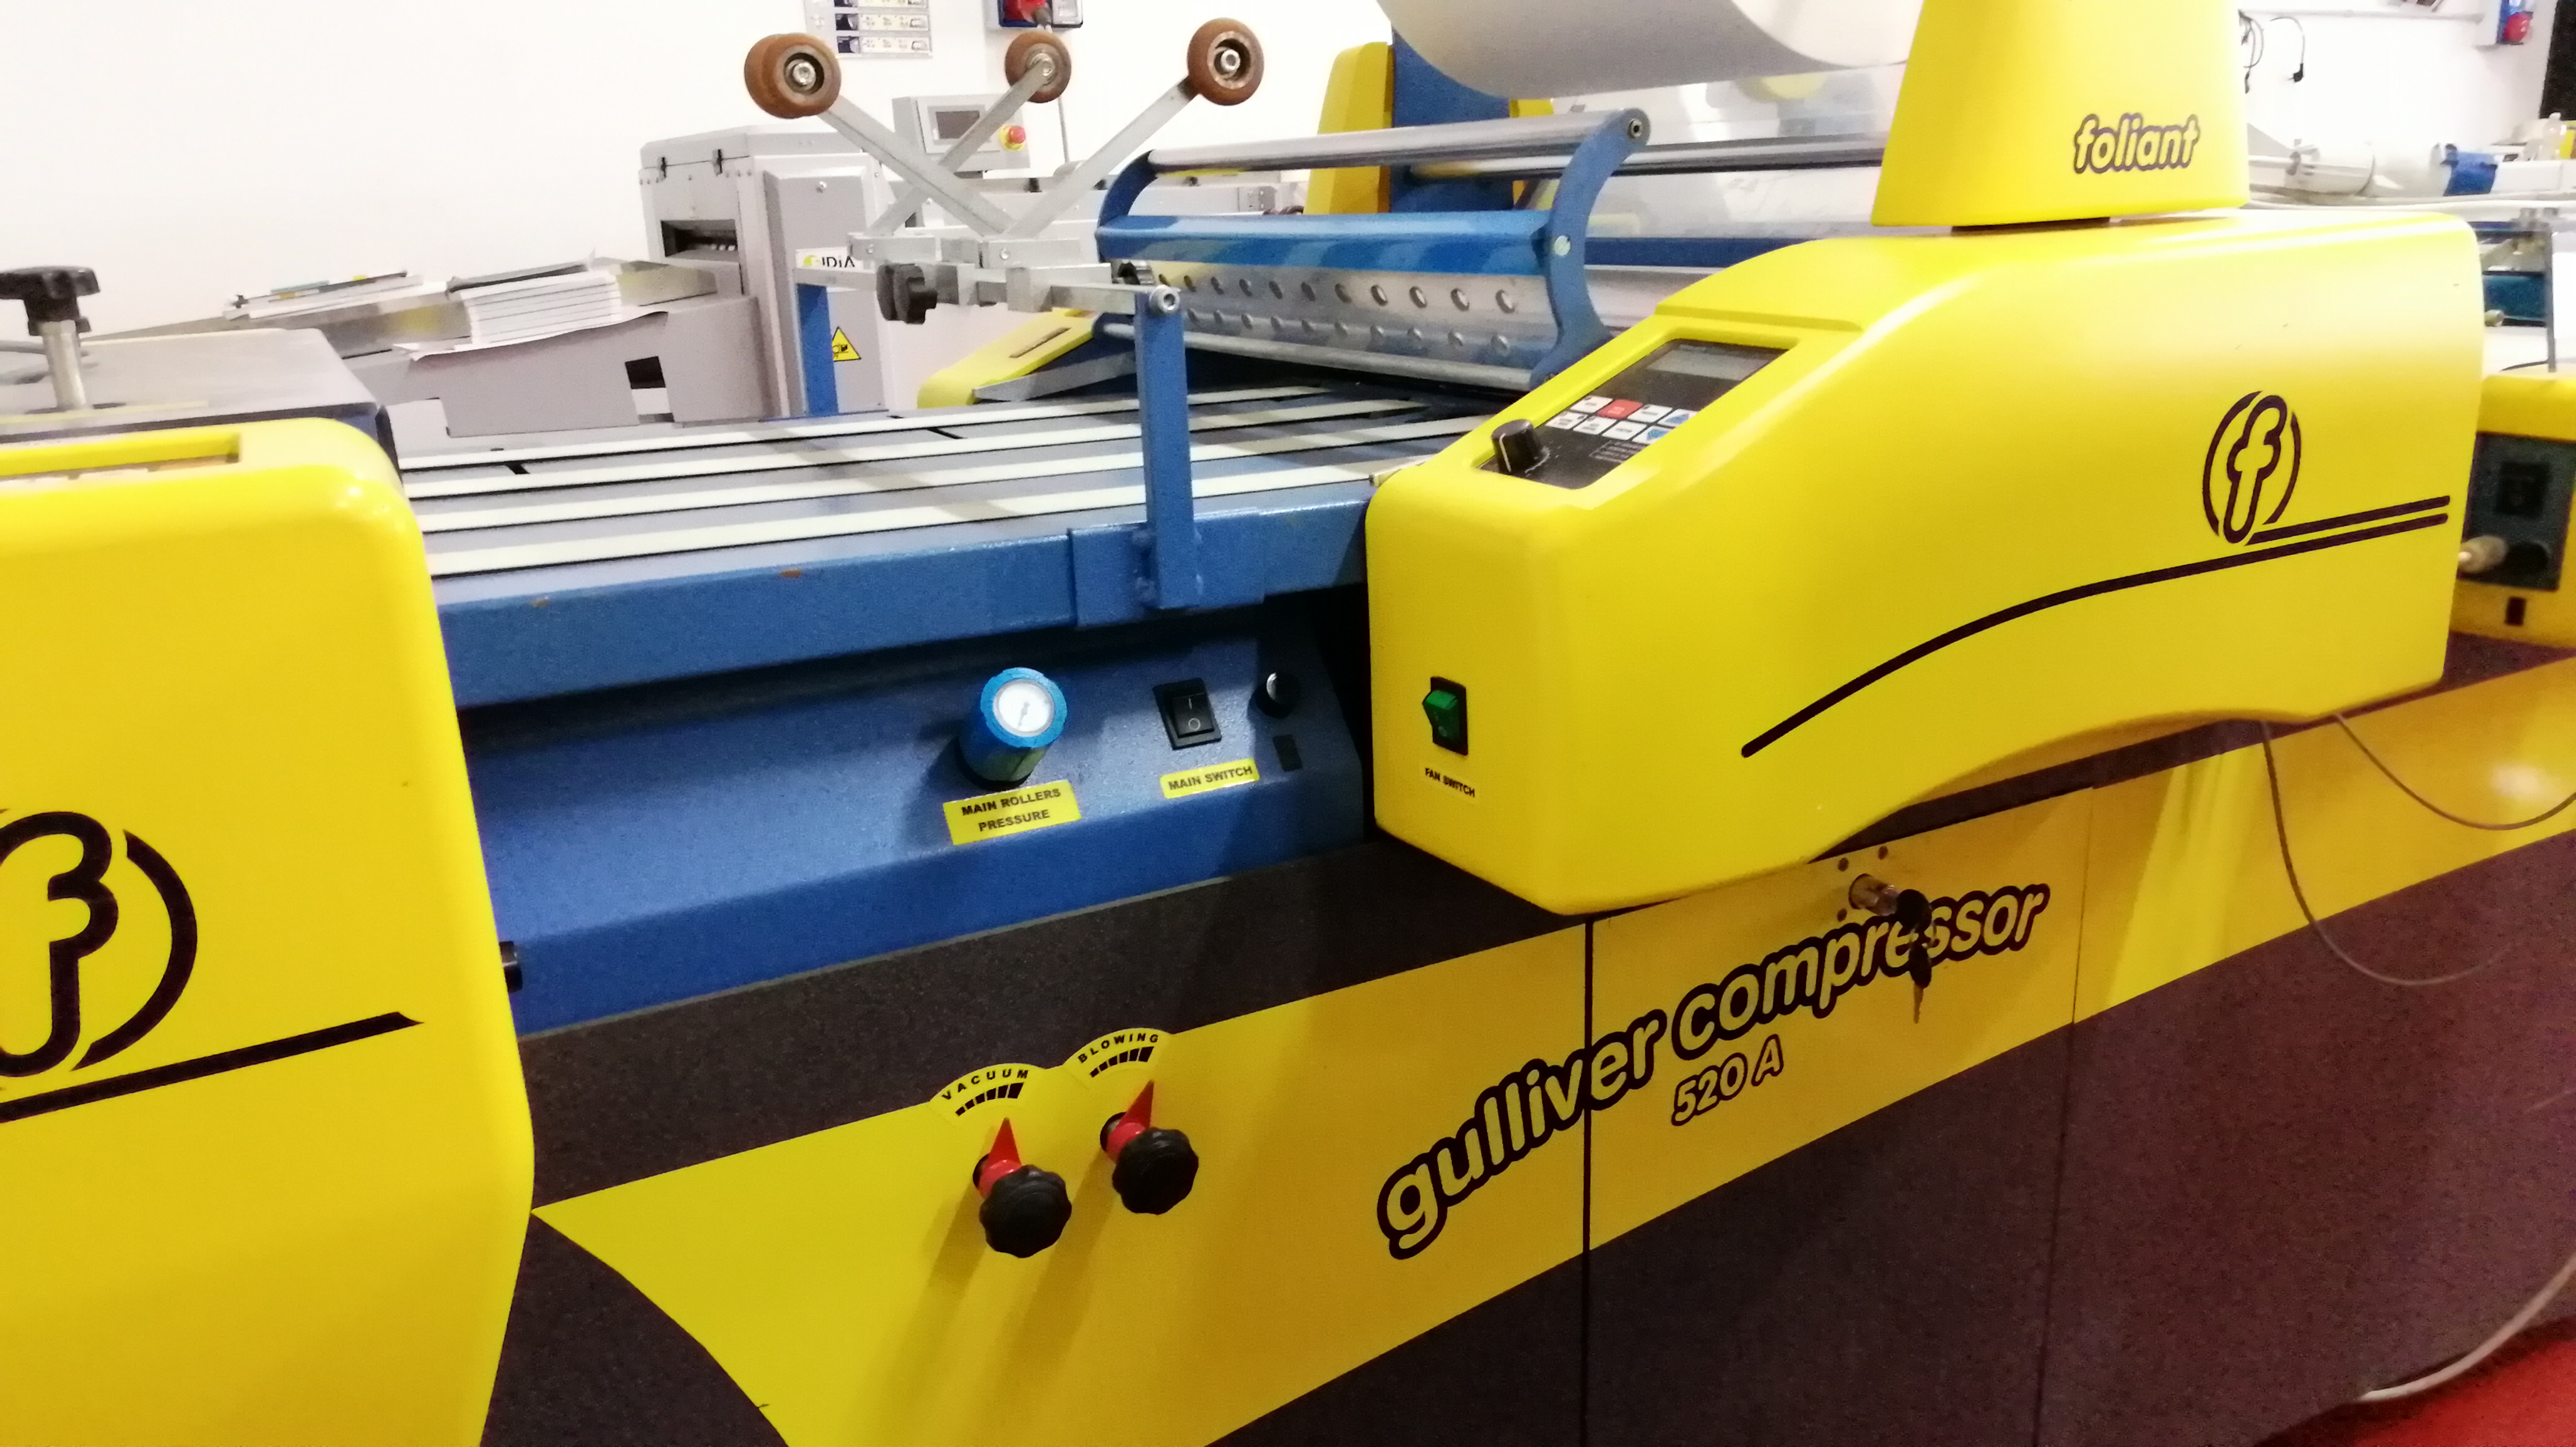 Laminatrice Plastificatrice Foliant Gulliver C520-A in vendita - foto 1